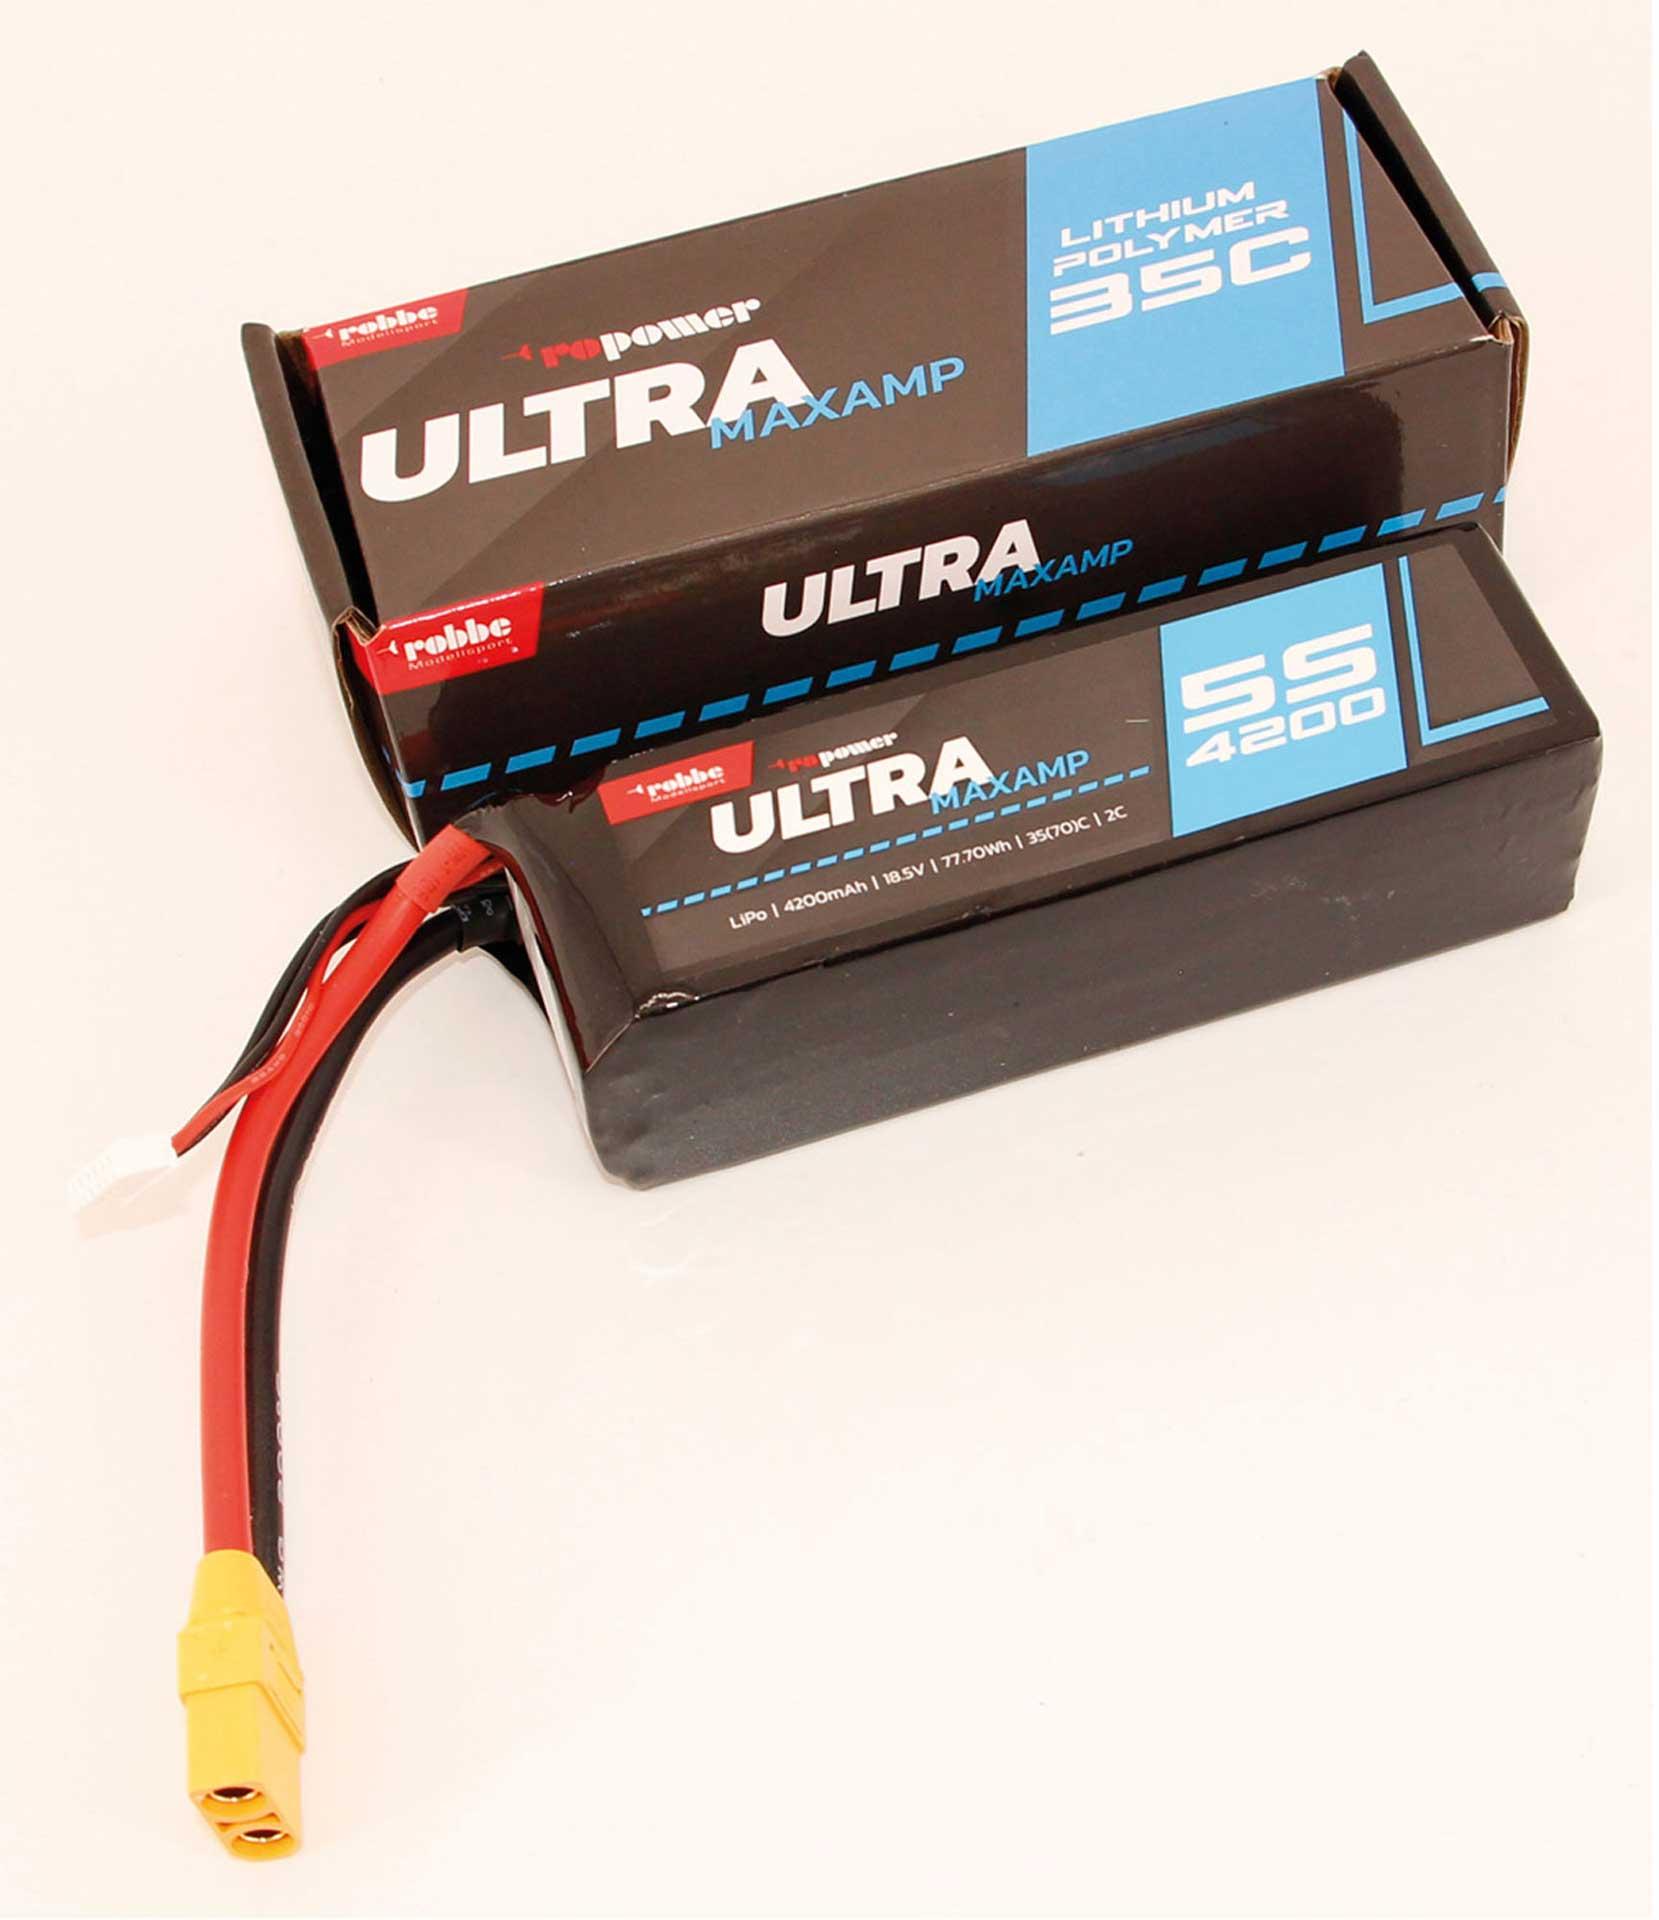 ROBBE RO-POWER ULTRA MAXAMP 4200MAH 18,5 VOLT 5S 35(70)C LIPO AKKU